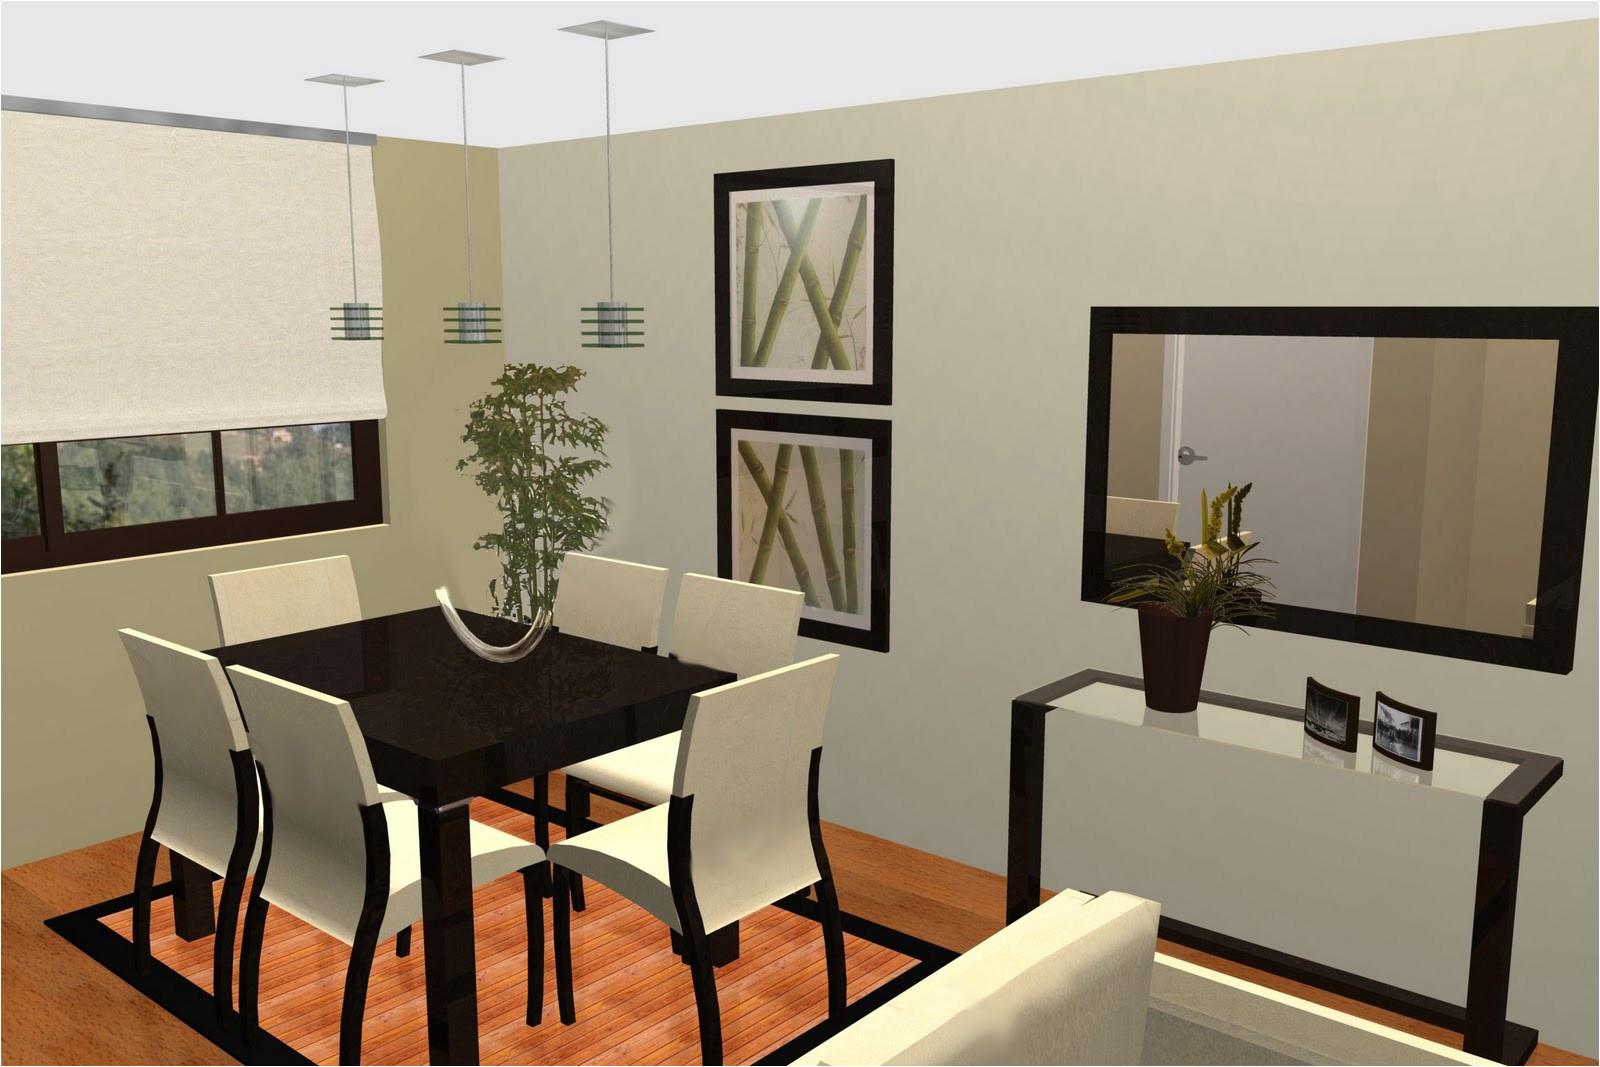 latest full size of decoracion pequenos ambientes en metrosaa interiores ideas colores para casas decorar pequenas with decoracion de interiores pequeos